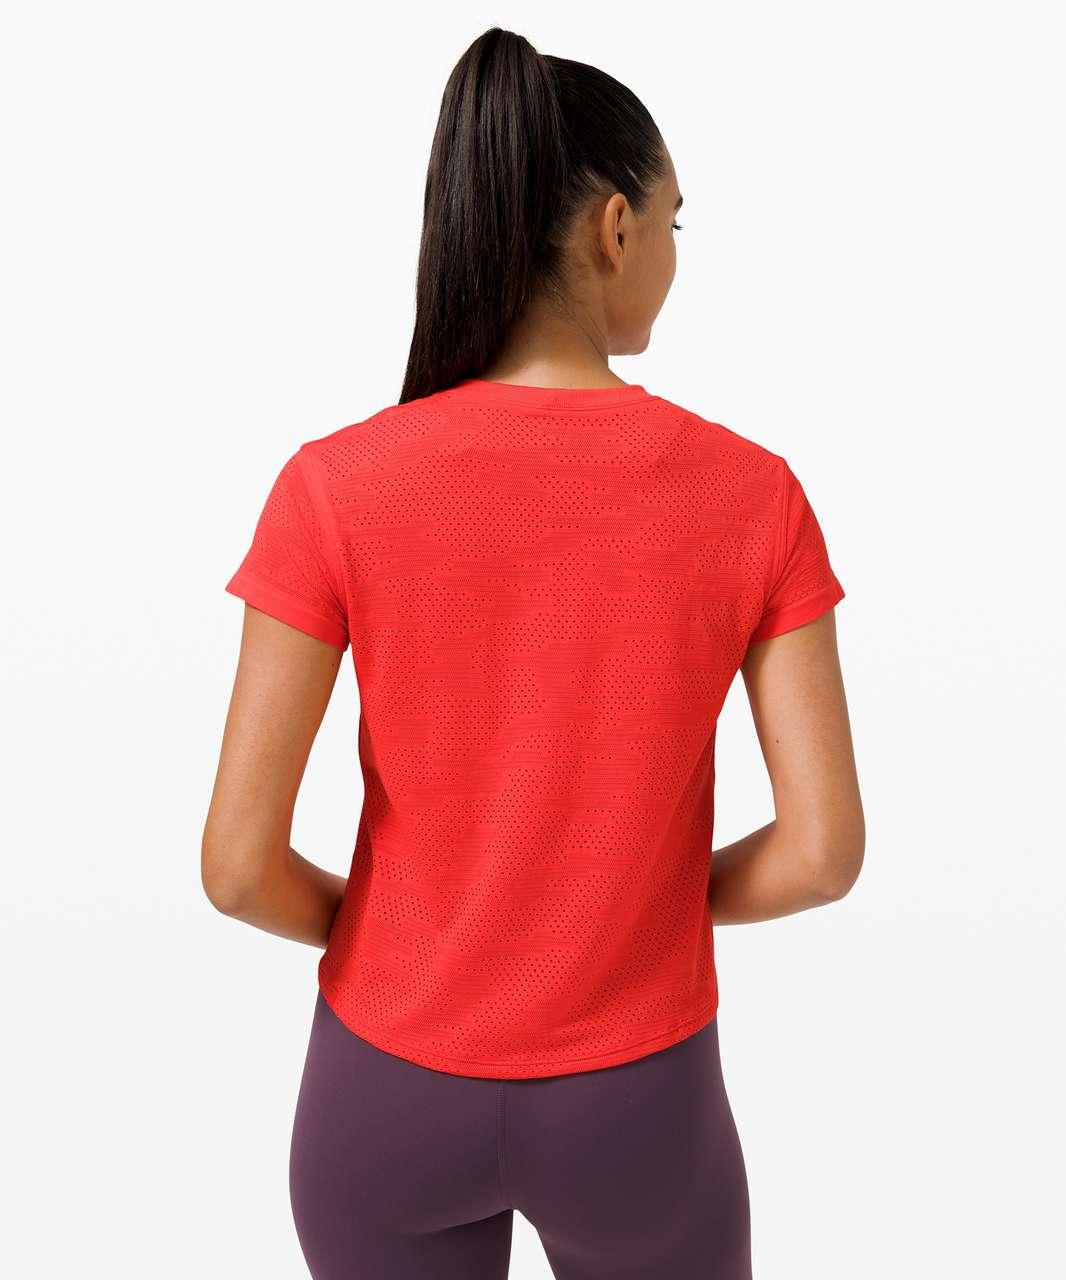 Lululemon Train to Be Short Sleeve *Camo - Dot Camo Pink Punch